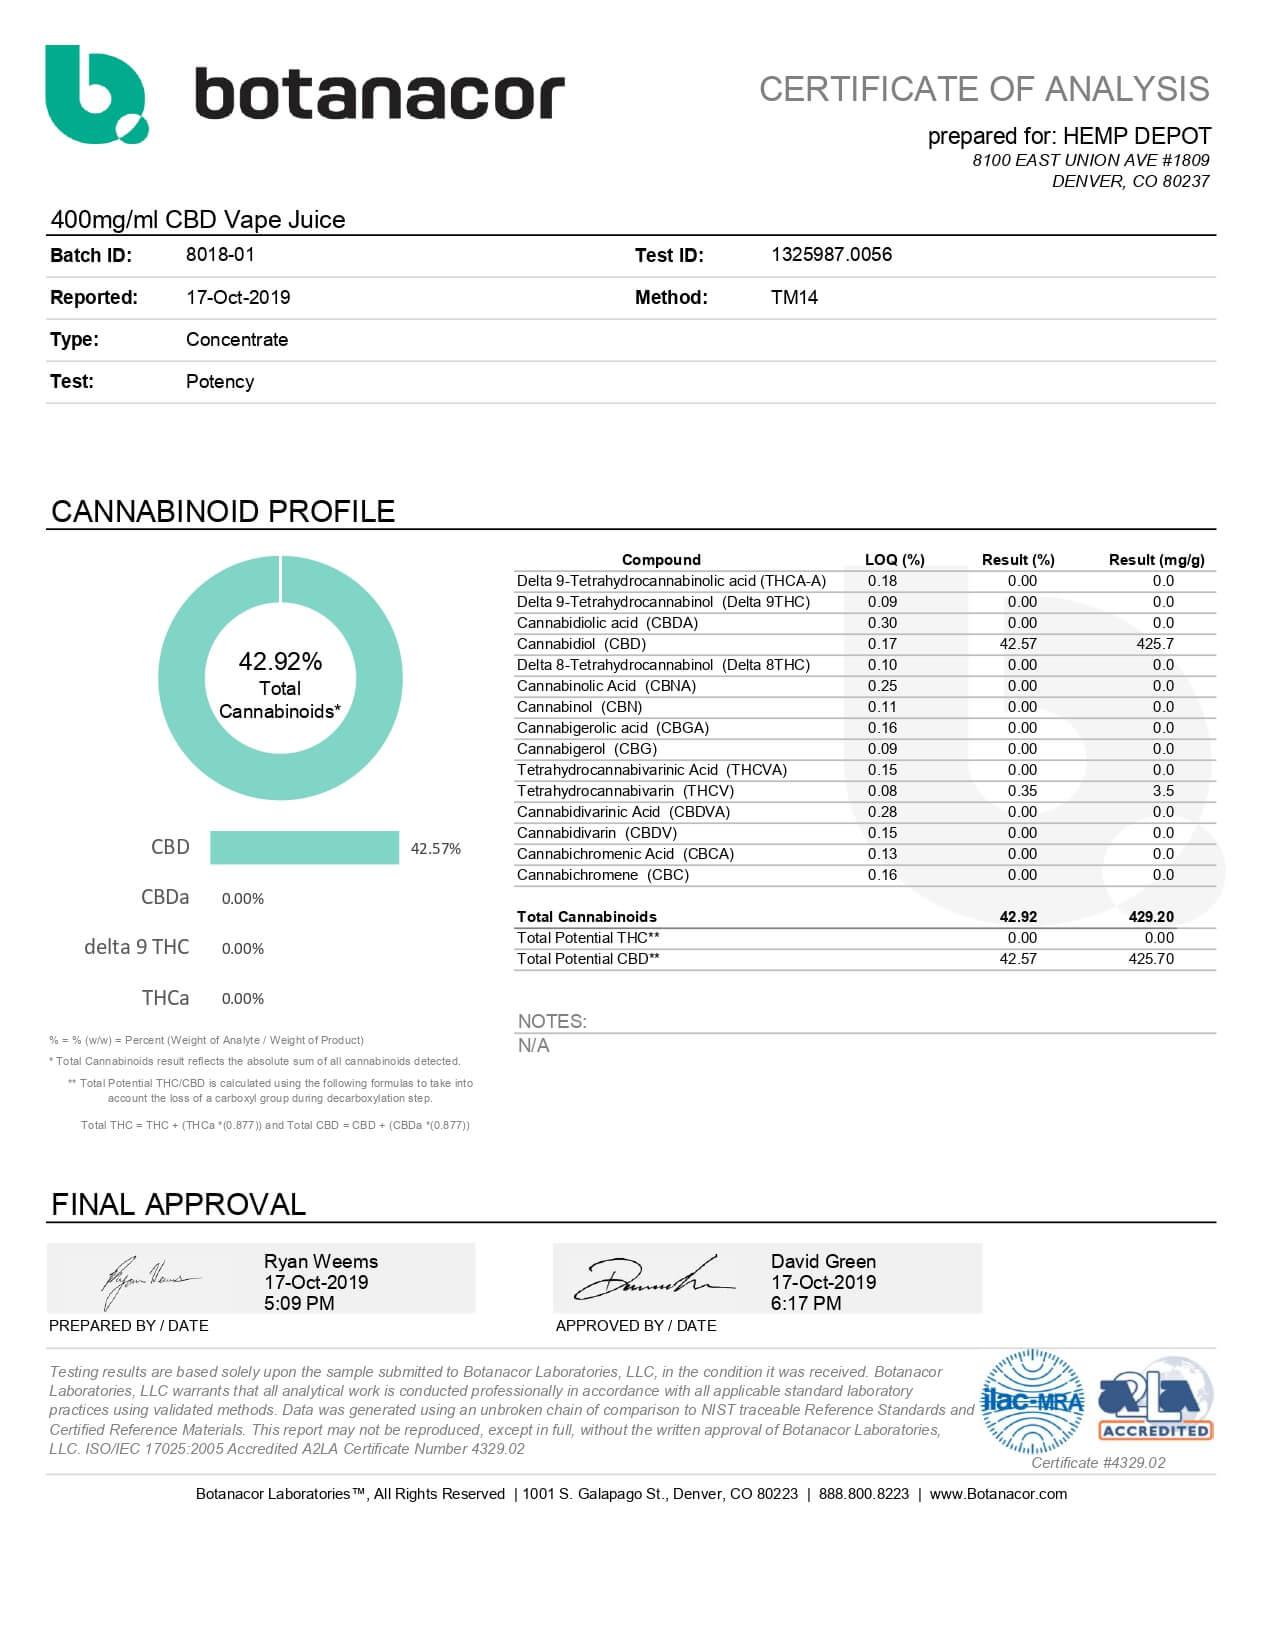 Cibadol ZERO CBD Vape Cart 1ml Ceramic Cell Lab Report